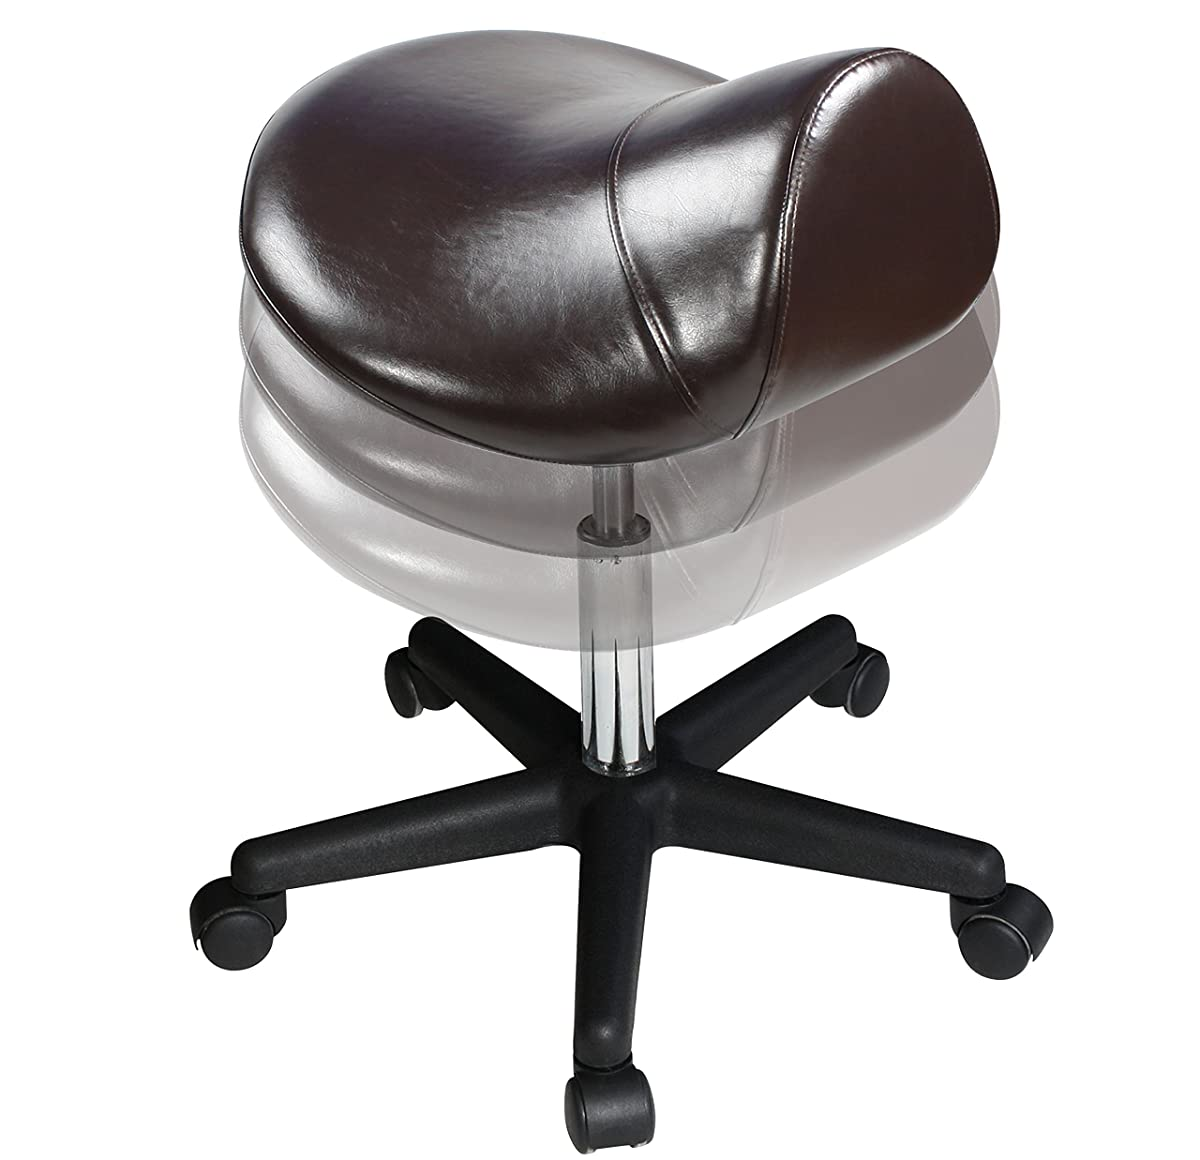 Master Massage Saddle Stool with NanoSkin Upholstery, Coffee